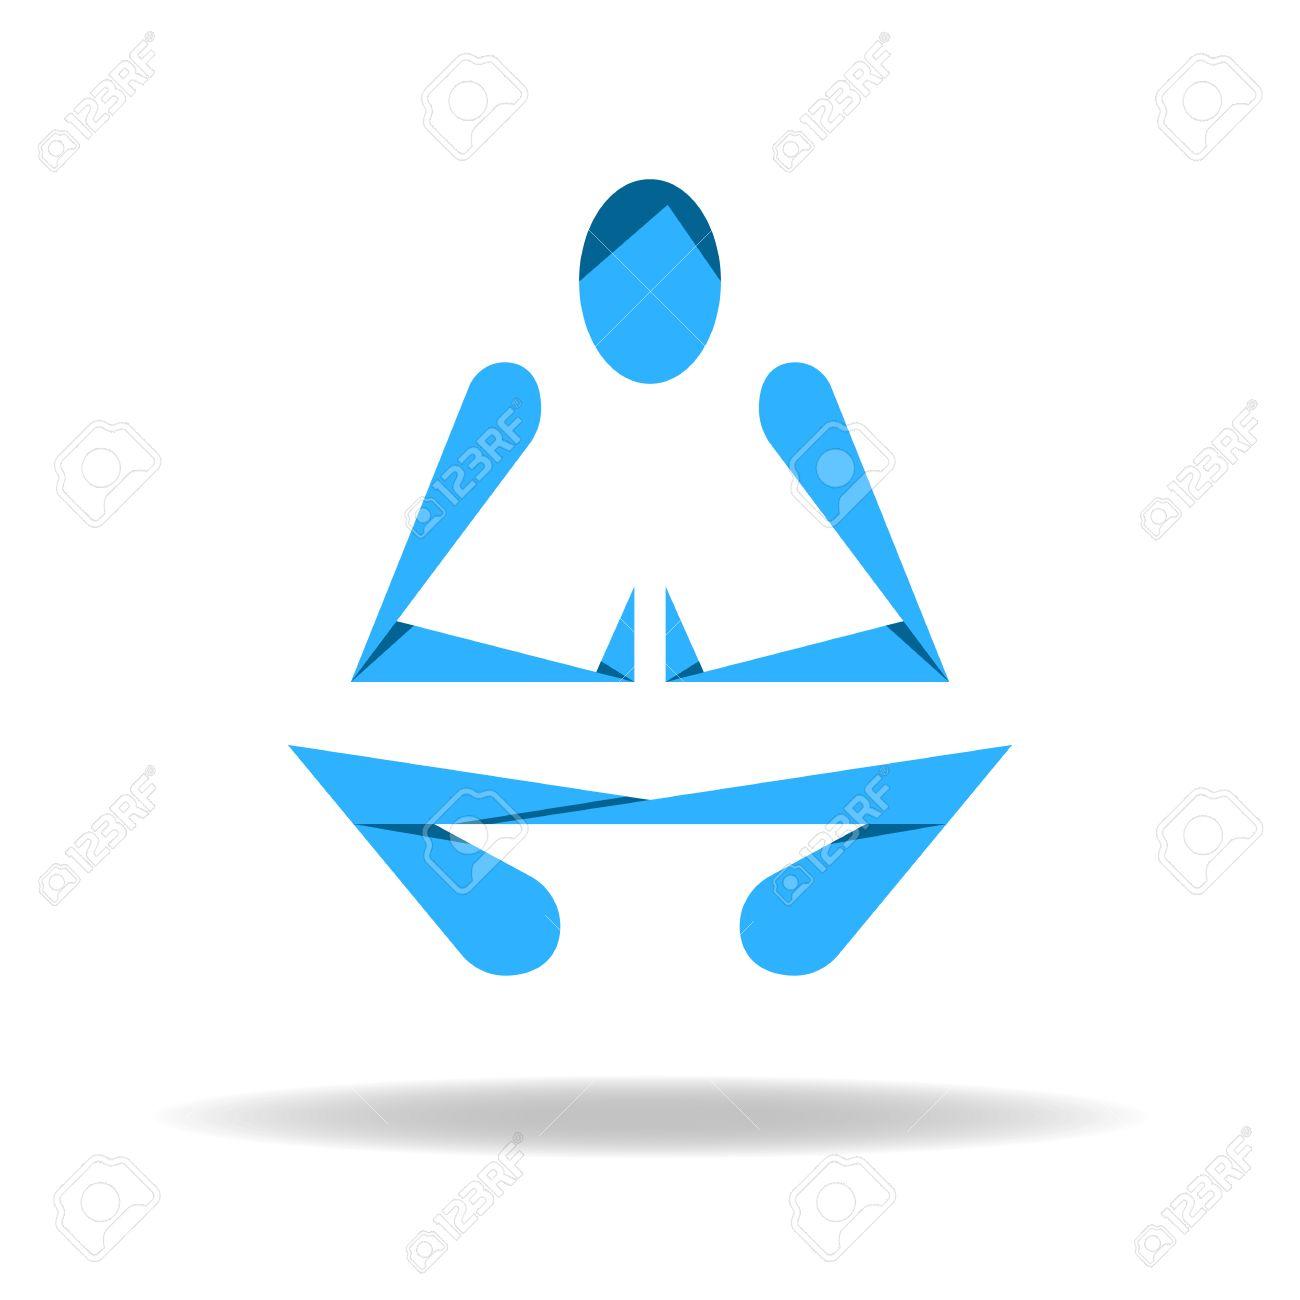 Ente Astratto Yoga Loto Porre Clipart Royalty.